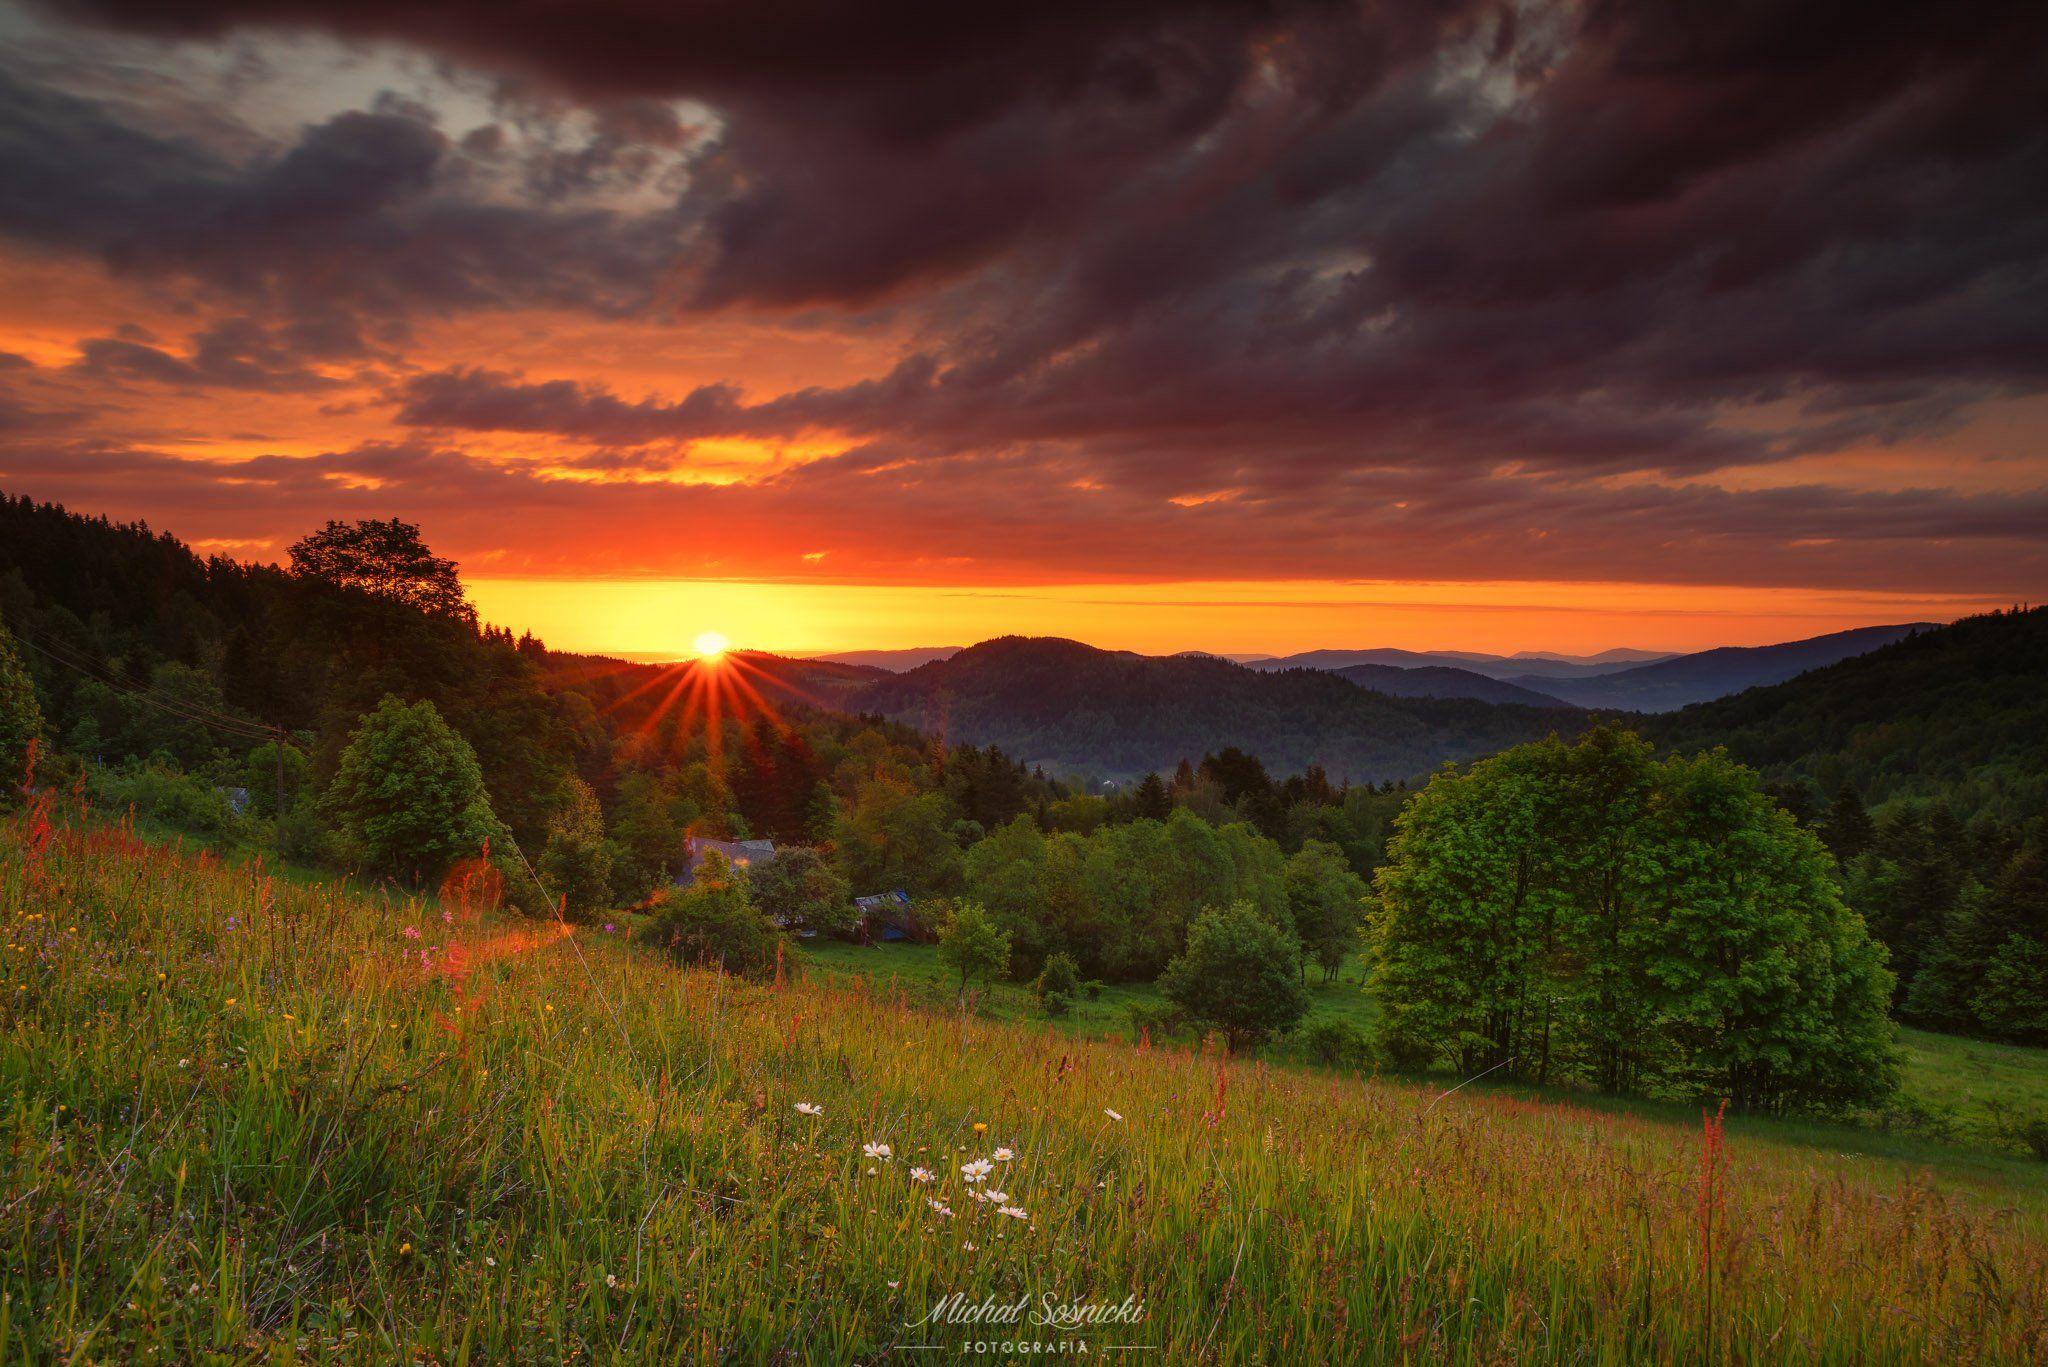 #spring #sun #sunrise #poland #morning #nature #landscape #pentax #benro, Sośnicki Michał